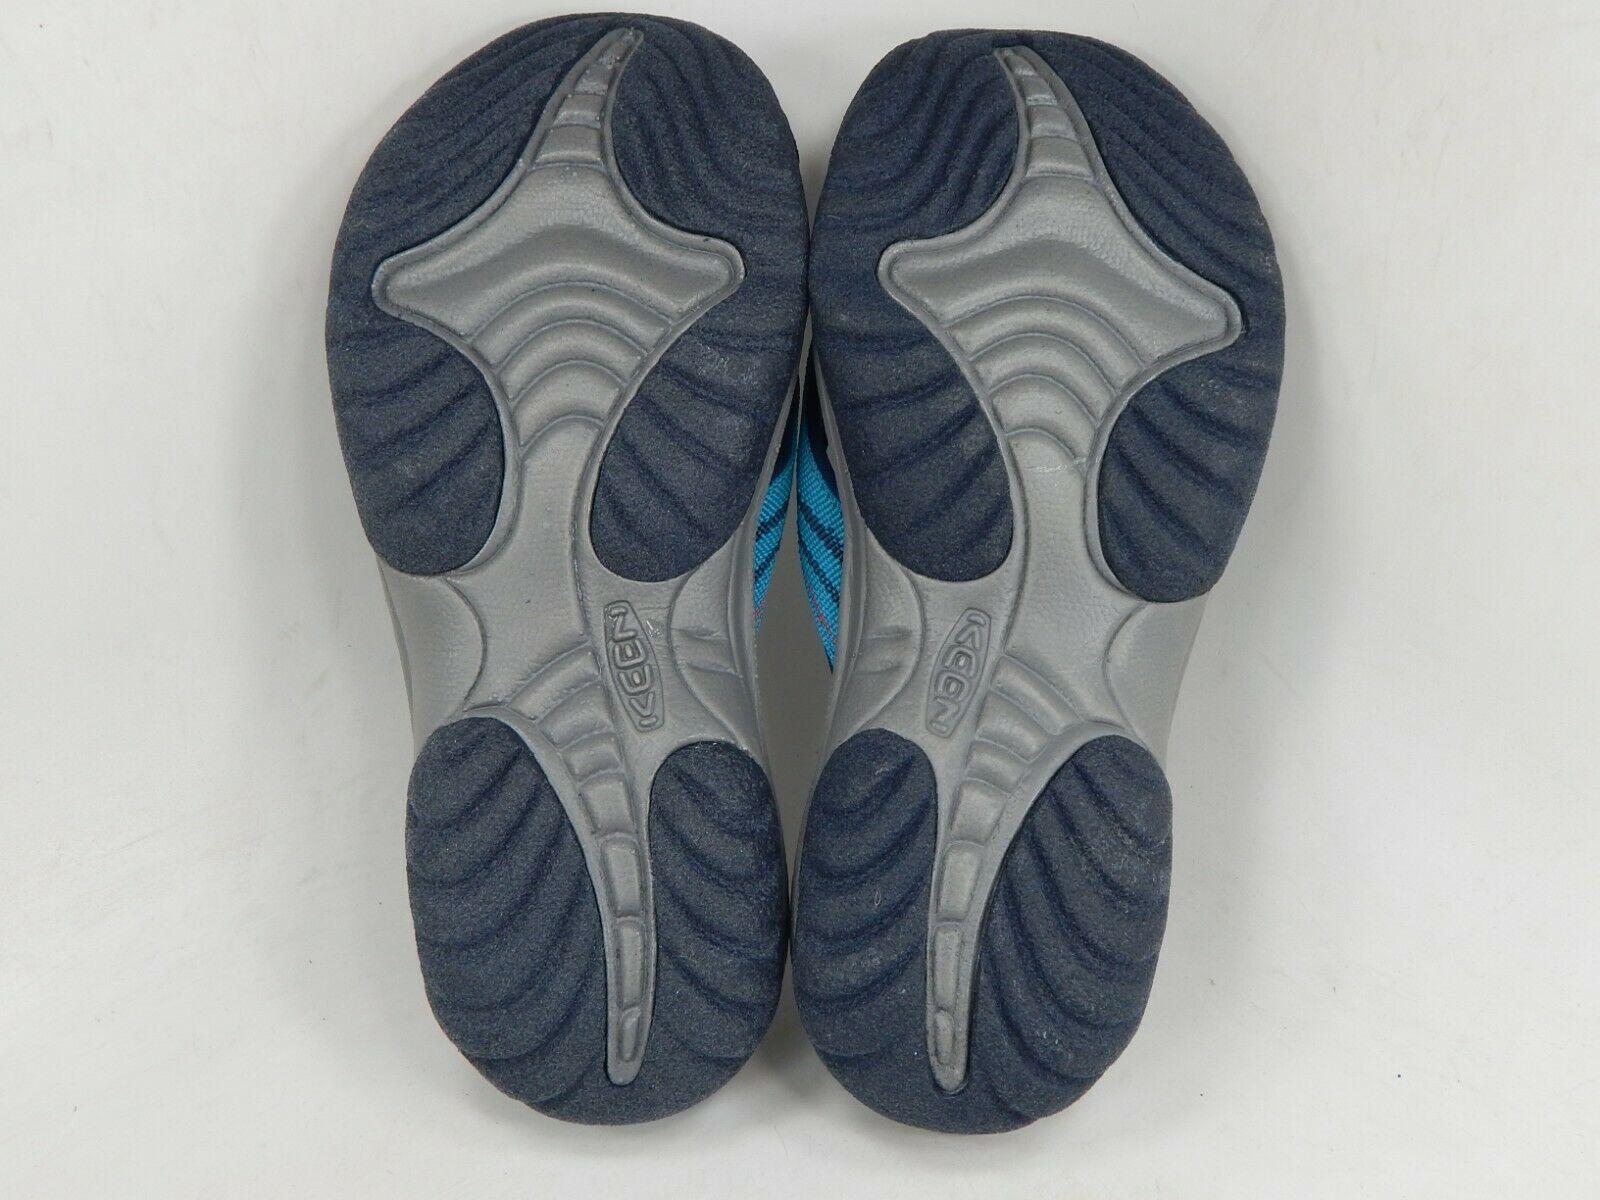 Keen Kona Flip II Sz US 8 M (B) Eu 38,5 Damen Sport Sandalen Blau Grün 1019295